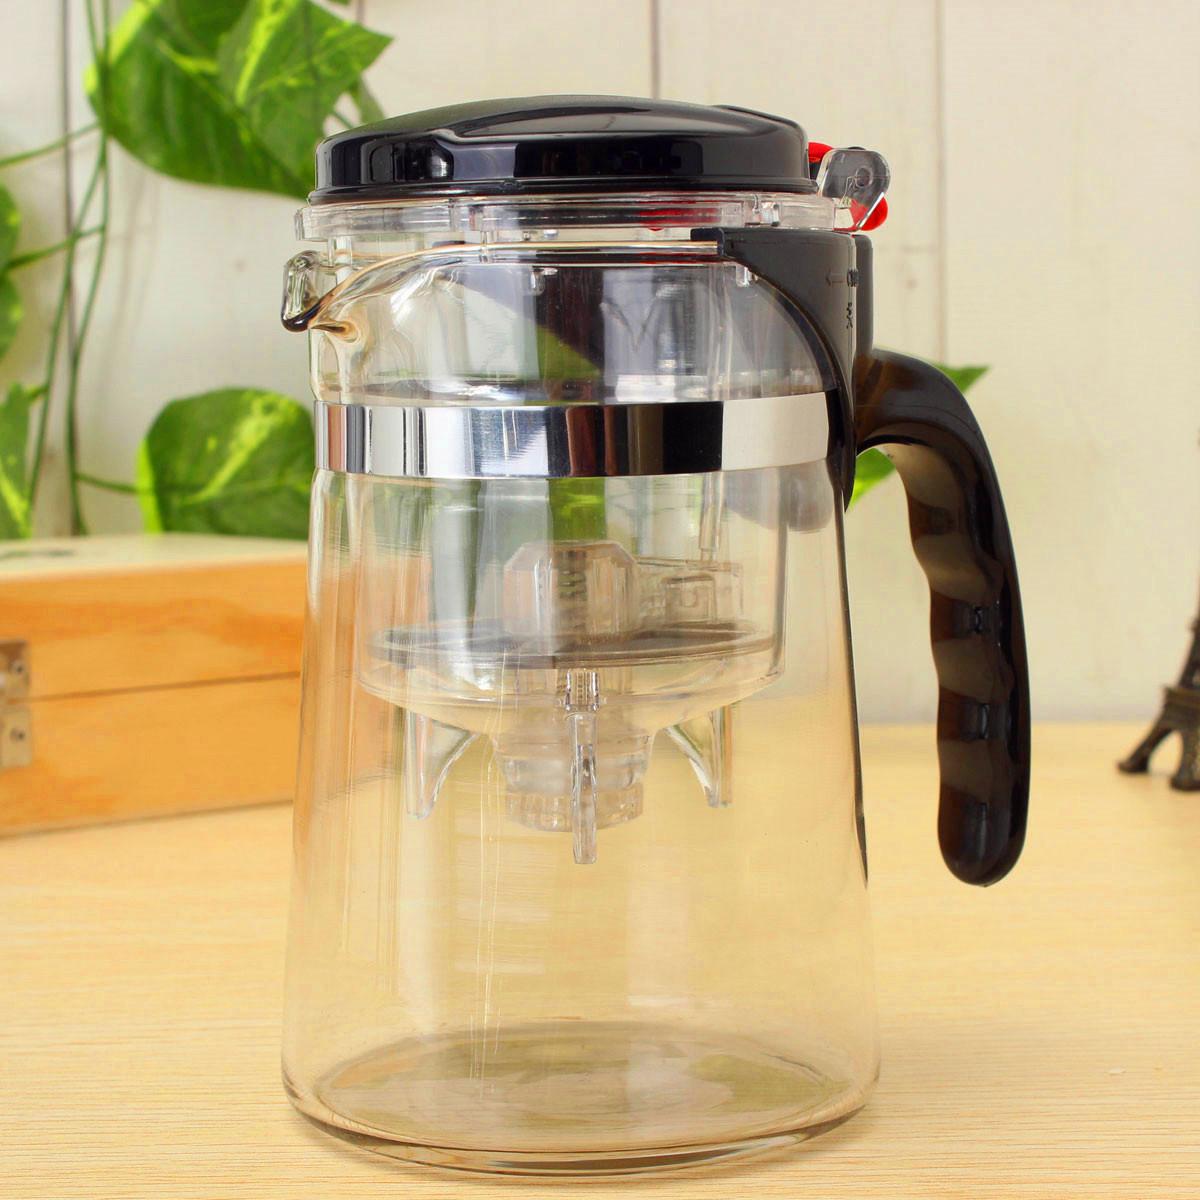 Glass Vase Coffee Maker : Clear Glass Tea Coffee Maker Mug Pot With Filter Infuser Straight 500ml 17Oz Lazada Malaysia